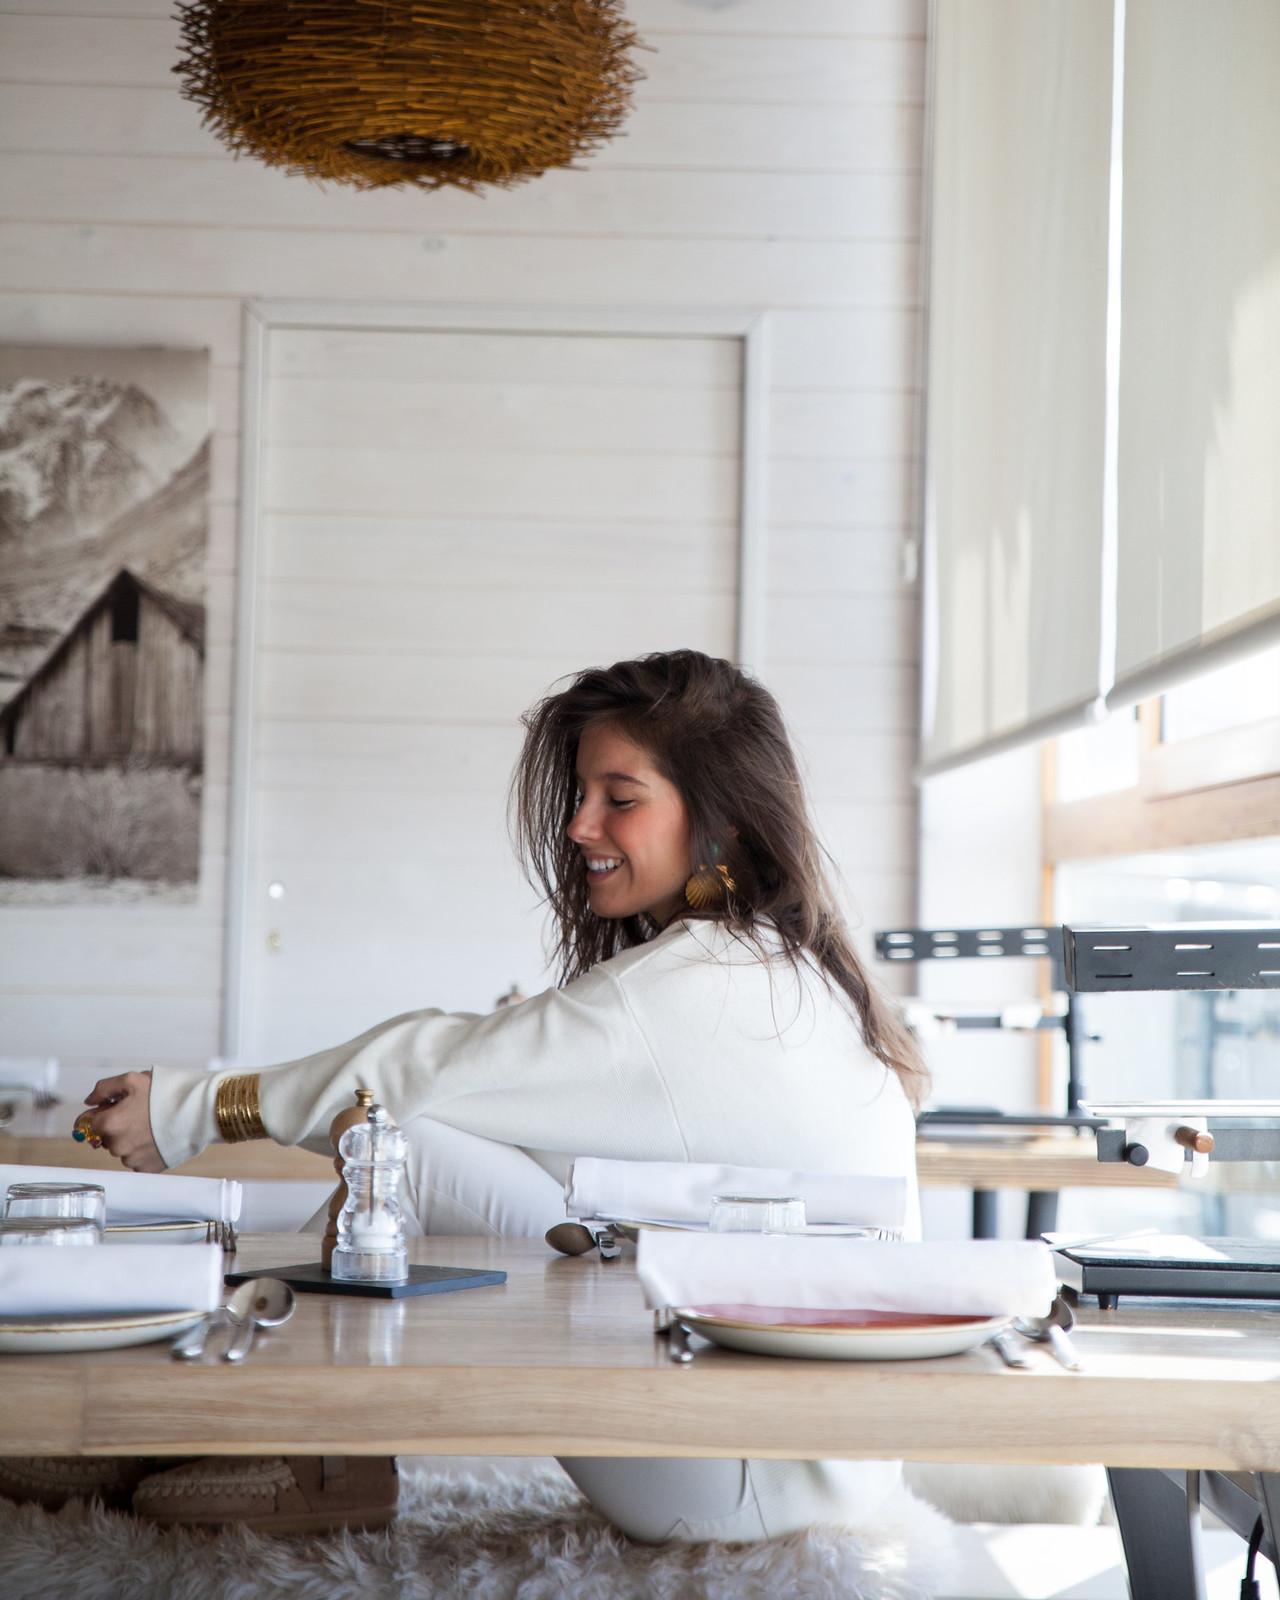 LA PLETA HOTEL DE LUJO EN BAQUEIRA BERET influencer lujo barcelona spain theguestgirl laura santolaria influencer viajes lifestyle travel spain